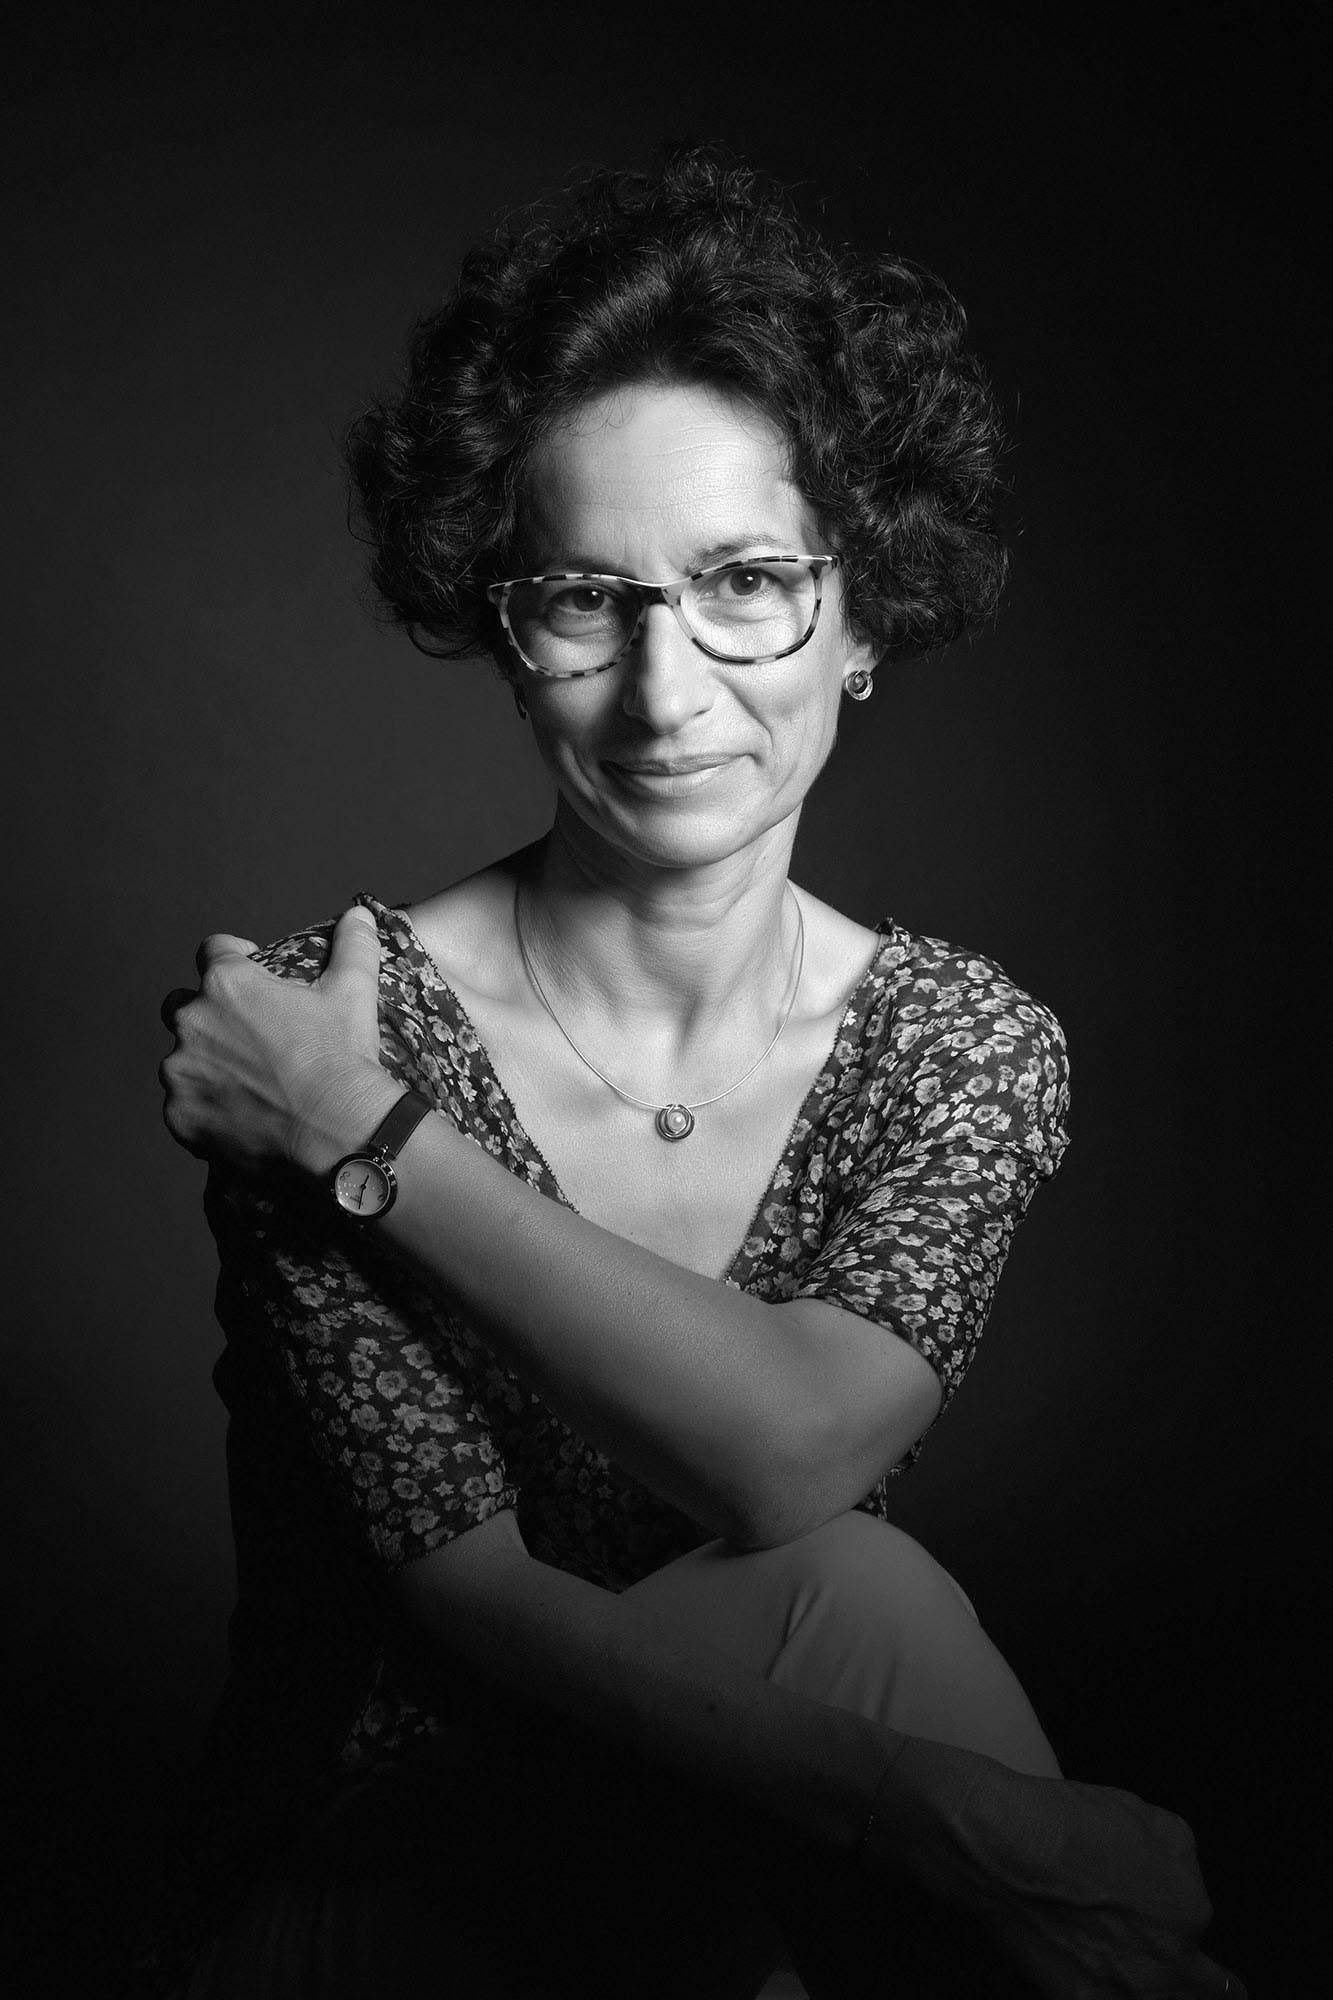 photographe-seance-photo-femme-pertuis-vaucluse-84